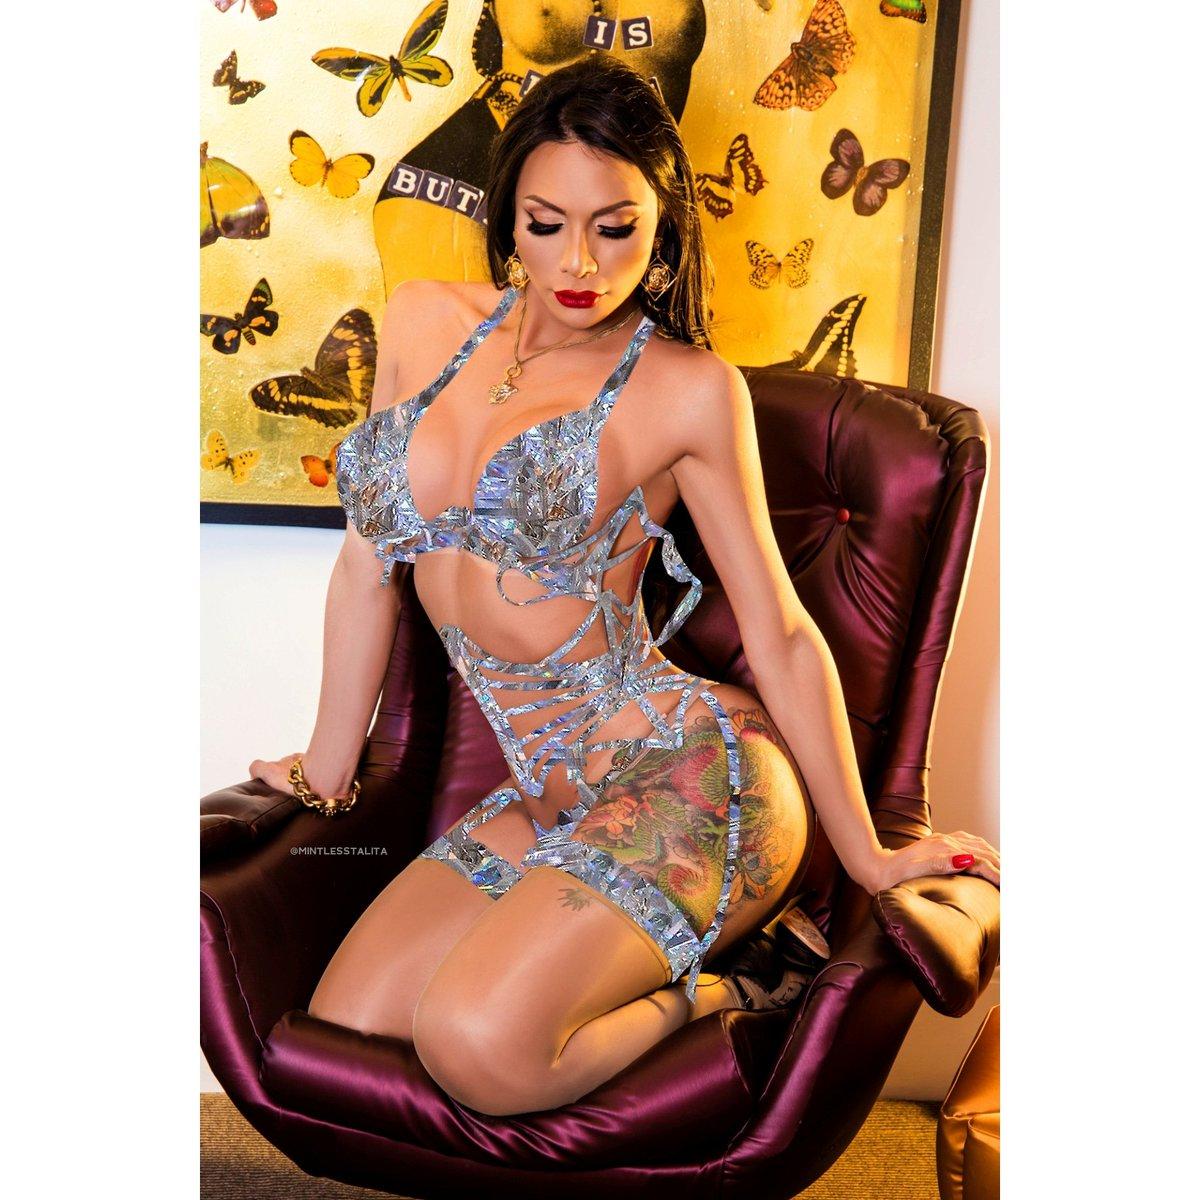 #londonts #londonshemale #london #ts #escort #londontranny #shemale #trans #bigcock #sexy #beautiful #ass #tits #tranny #ladyboy #cock #lingerie #mirror #hot #chelsea #Versace